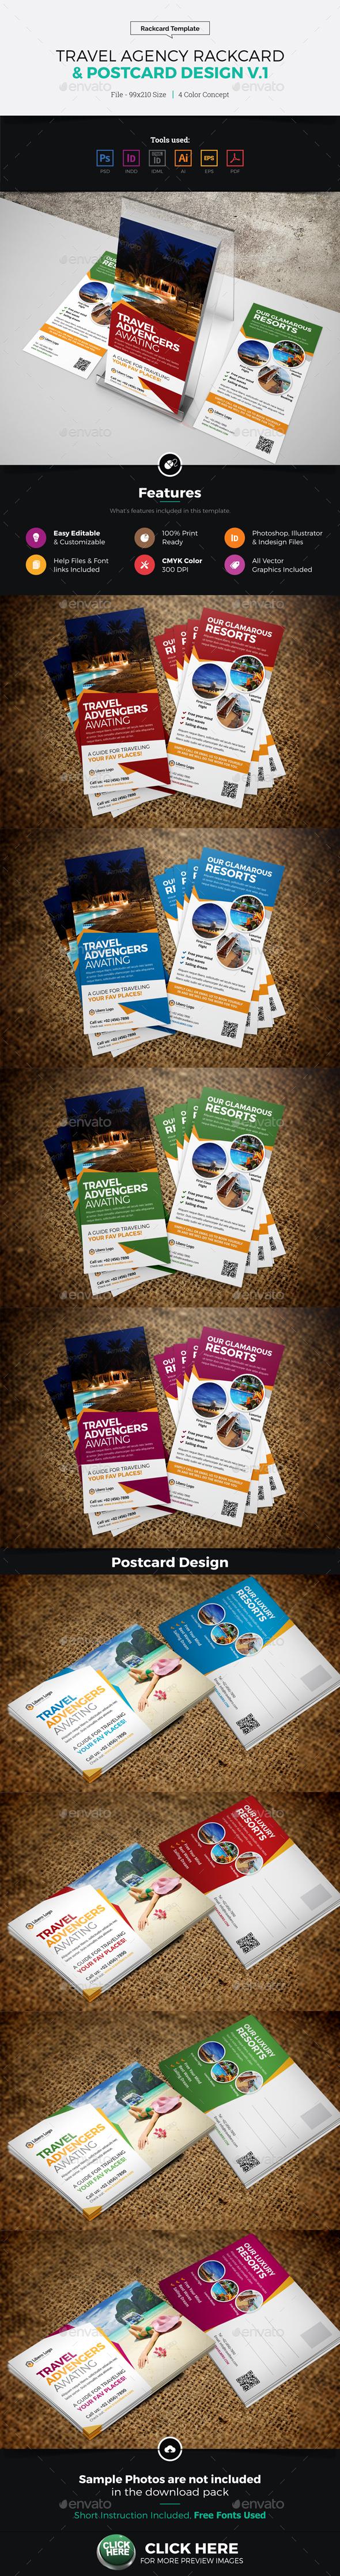 Travel Postcard Rackcard DL Flyer Design - Corporate Flyers